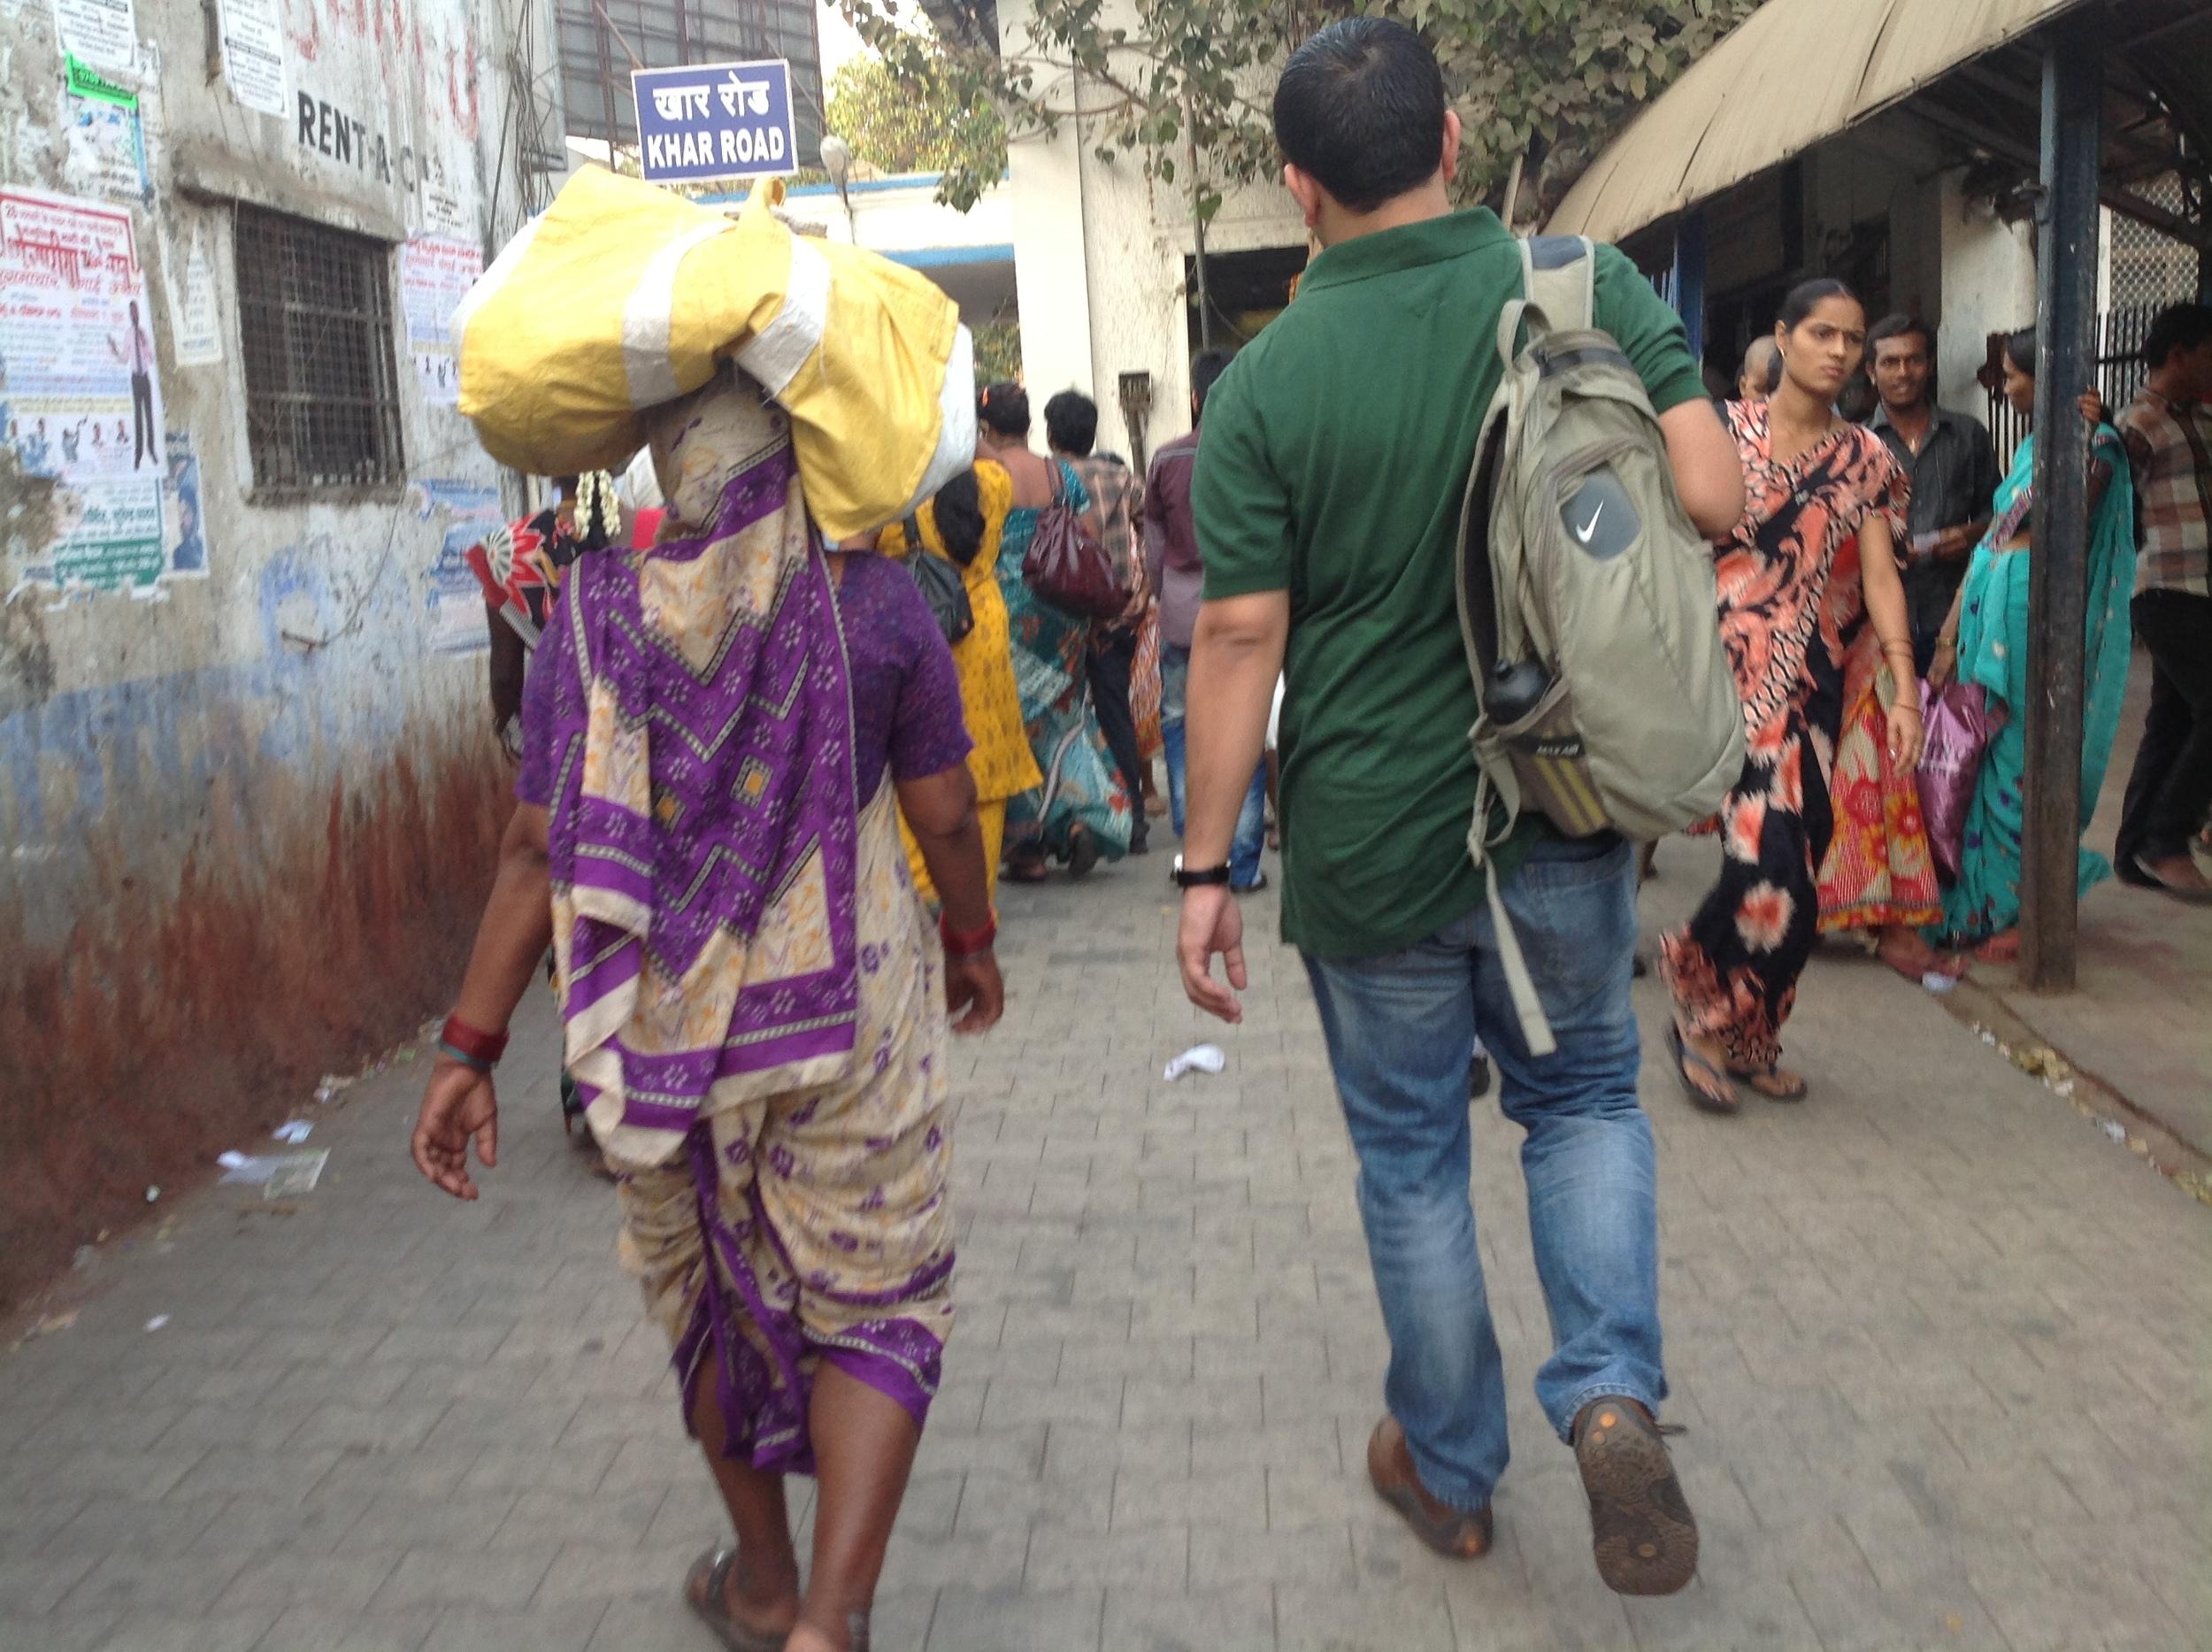 An Atma volunteer on their way to work in Mumbai.